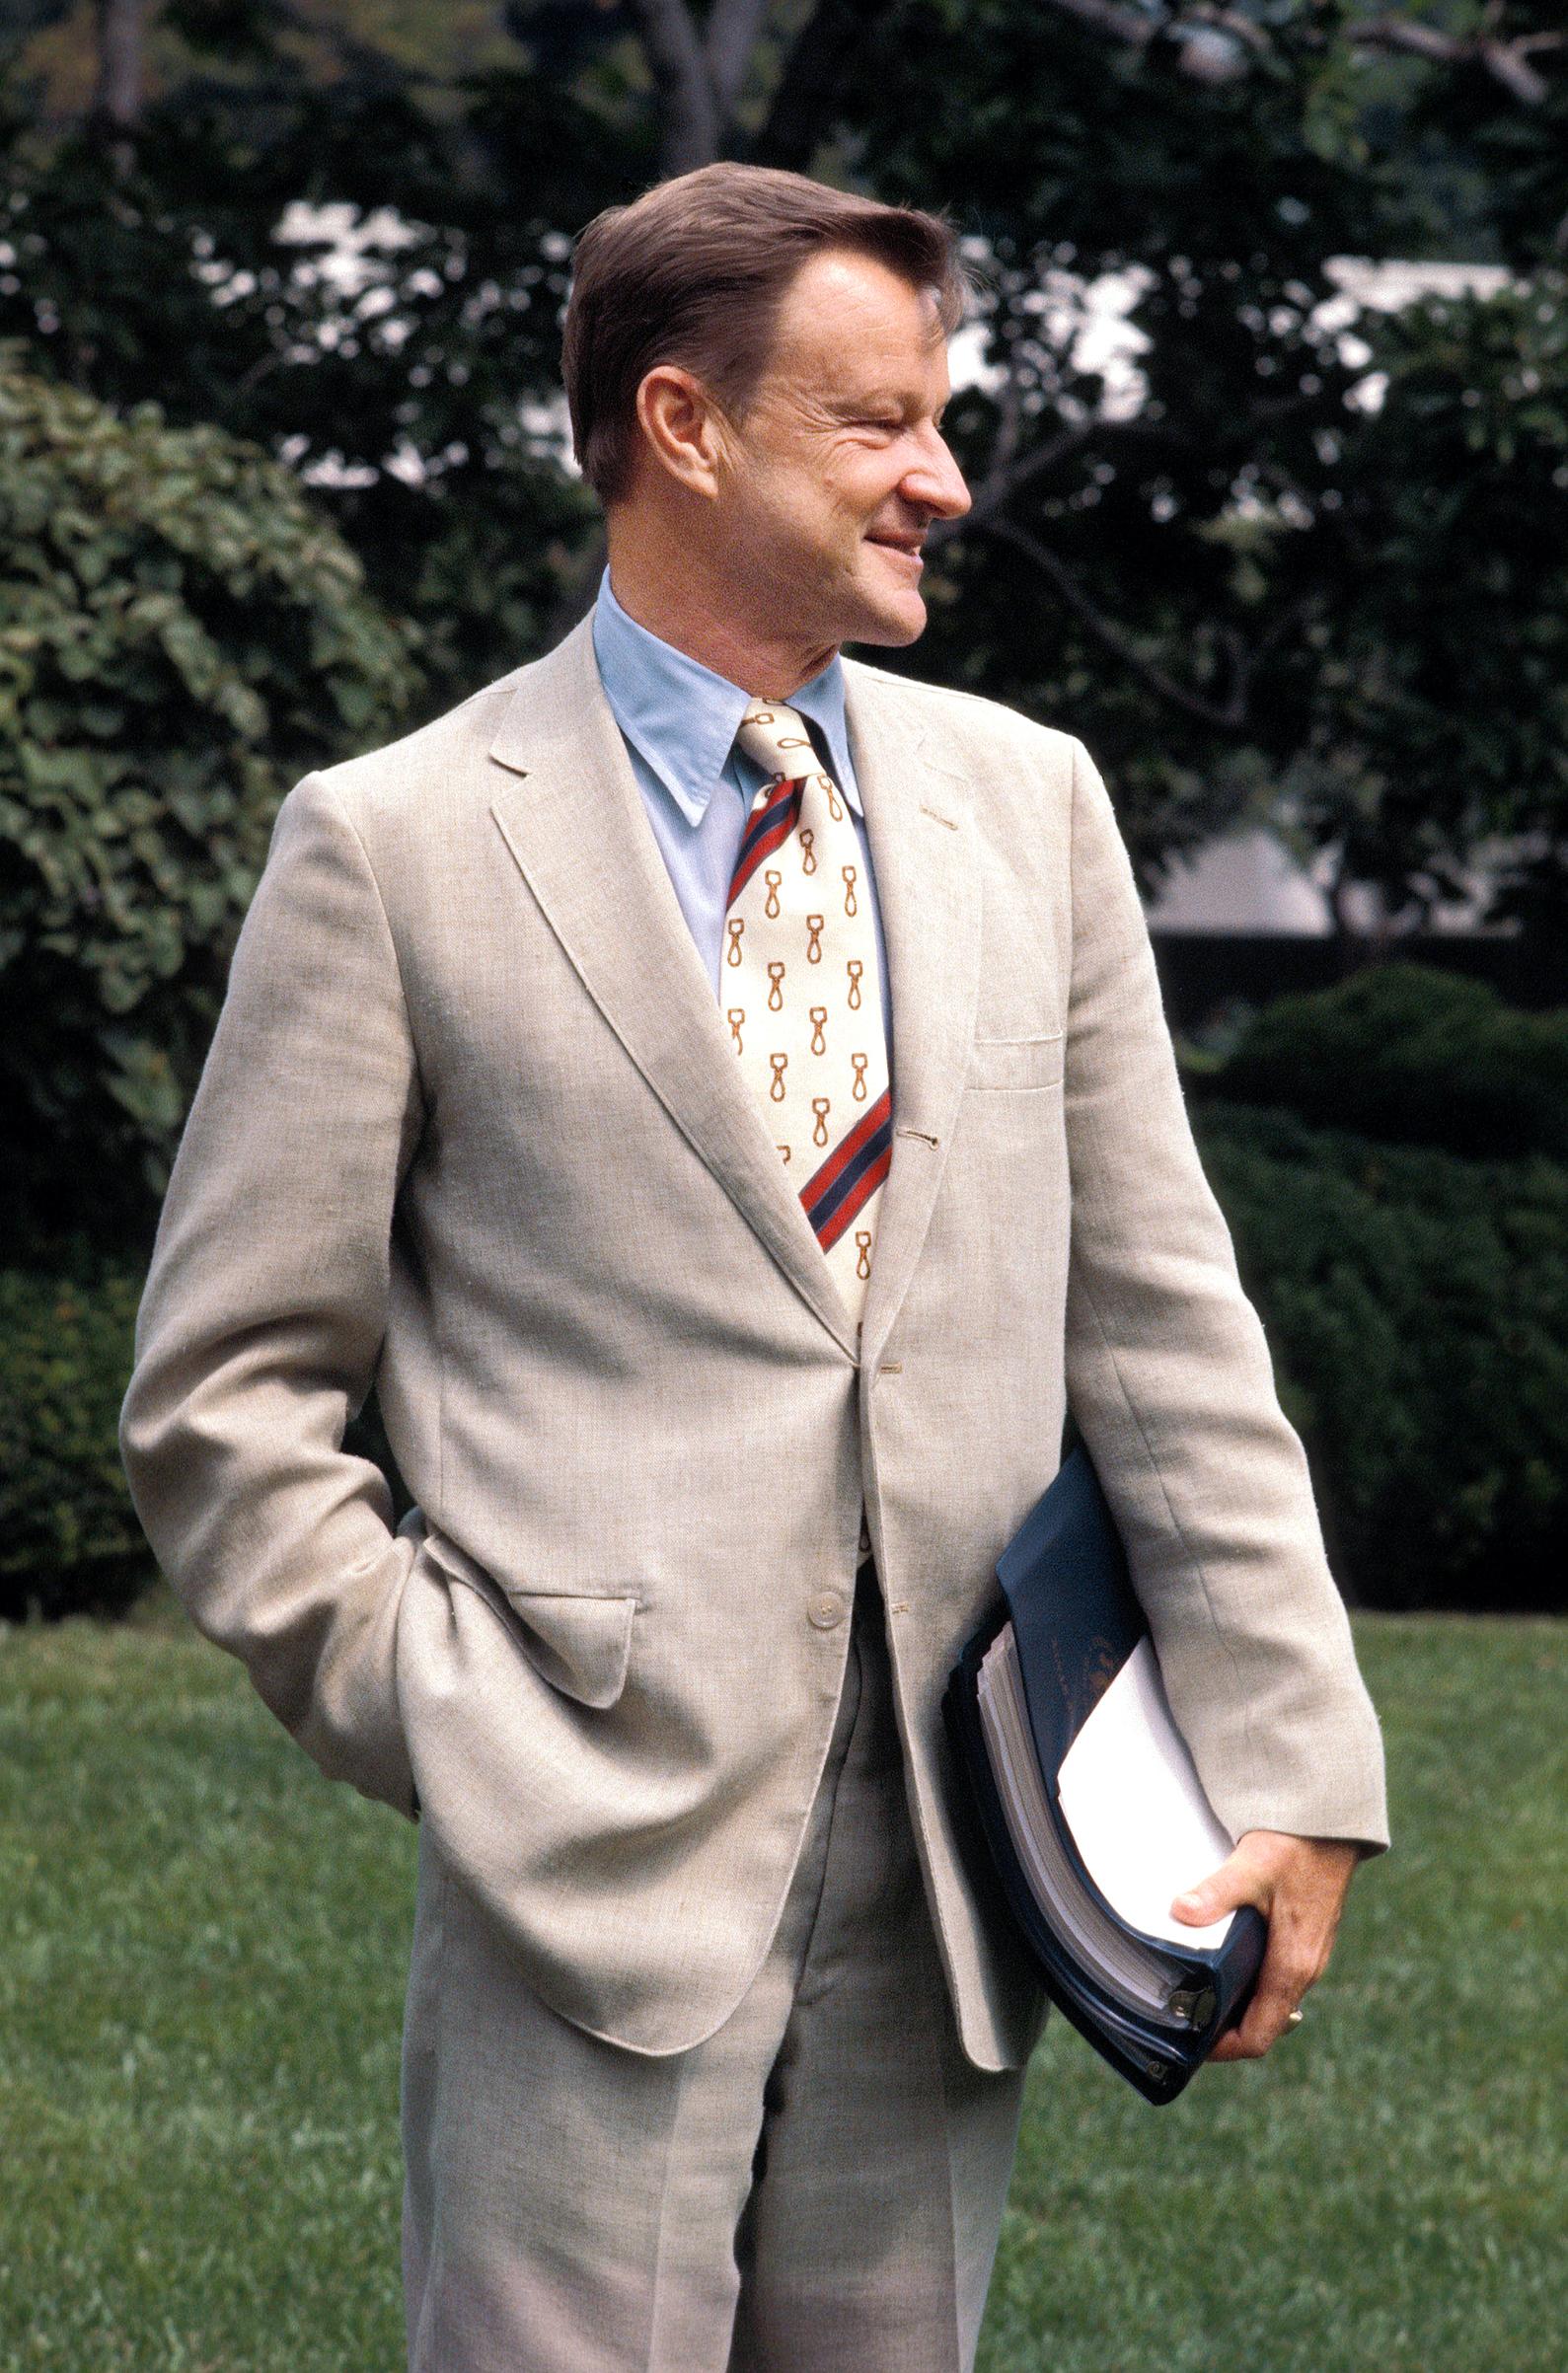 Brzezinski's sharp elbows and intellect served him well as a Washington insider